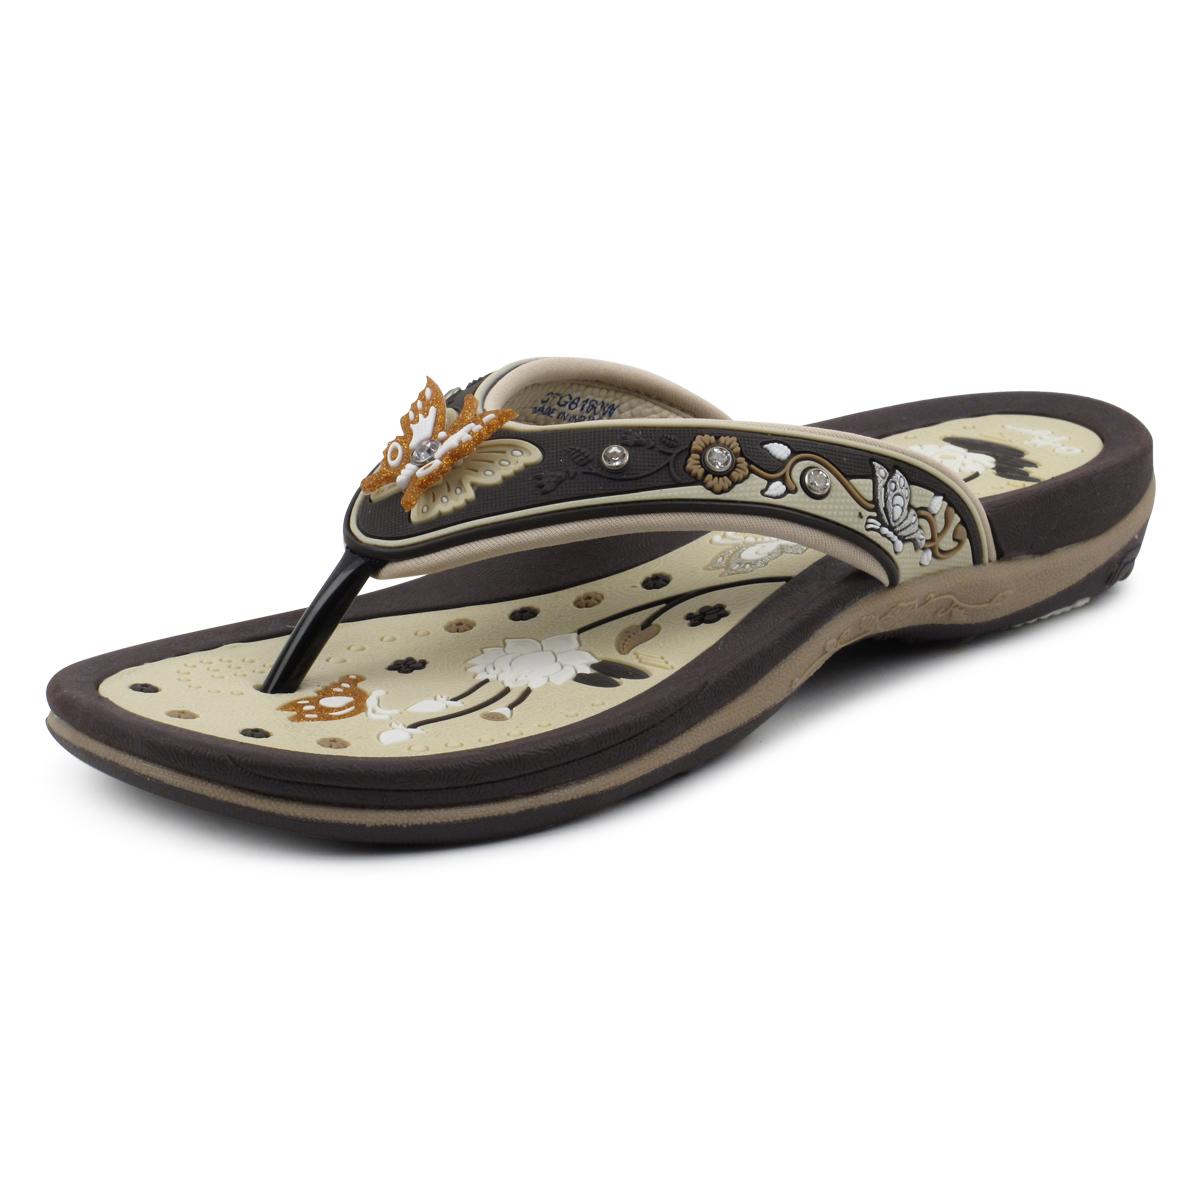 57895e2444 88   Hot Womens Shoes – Trendy Seychelles Shoes